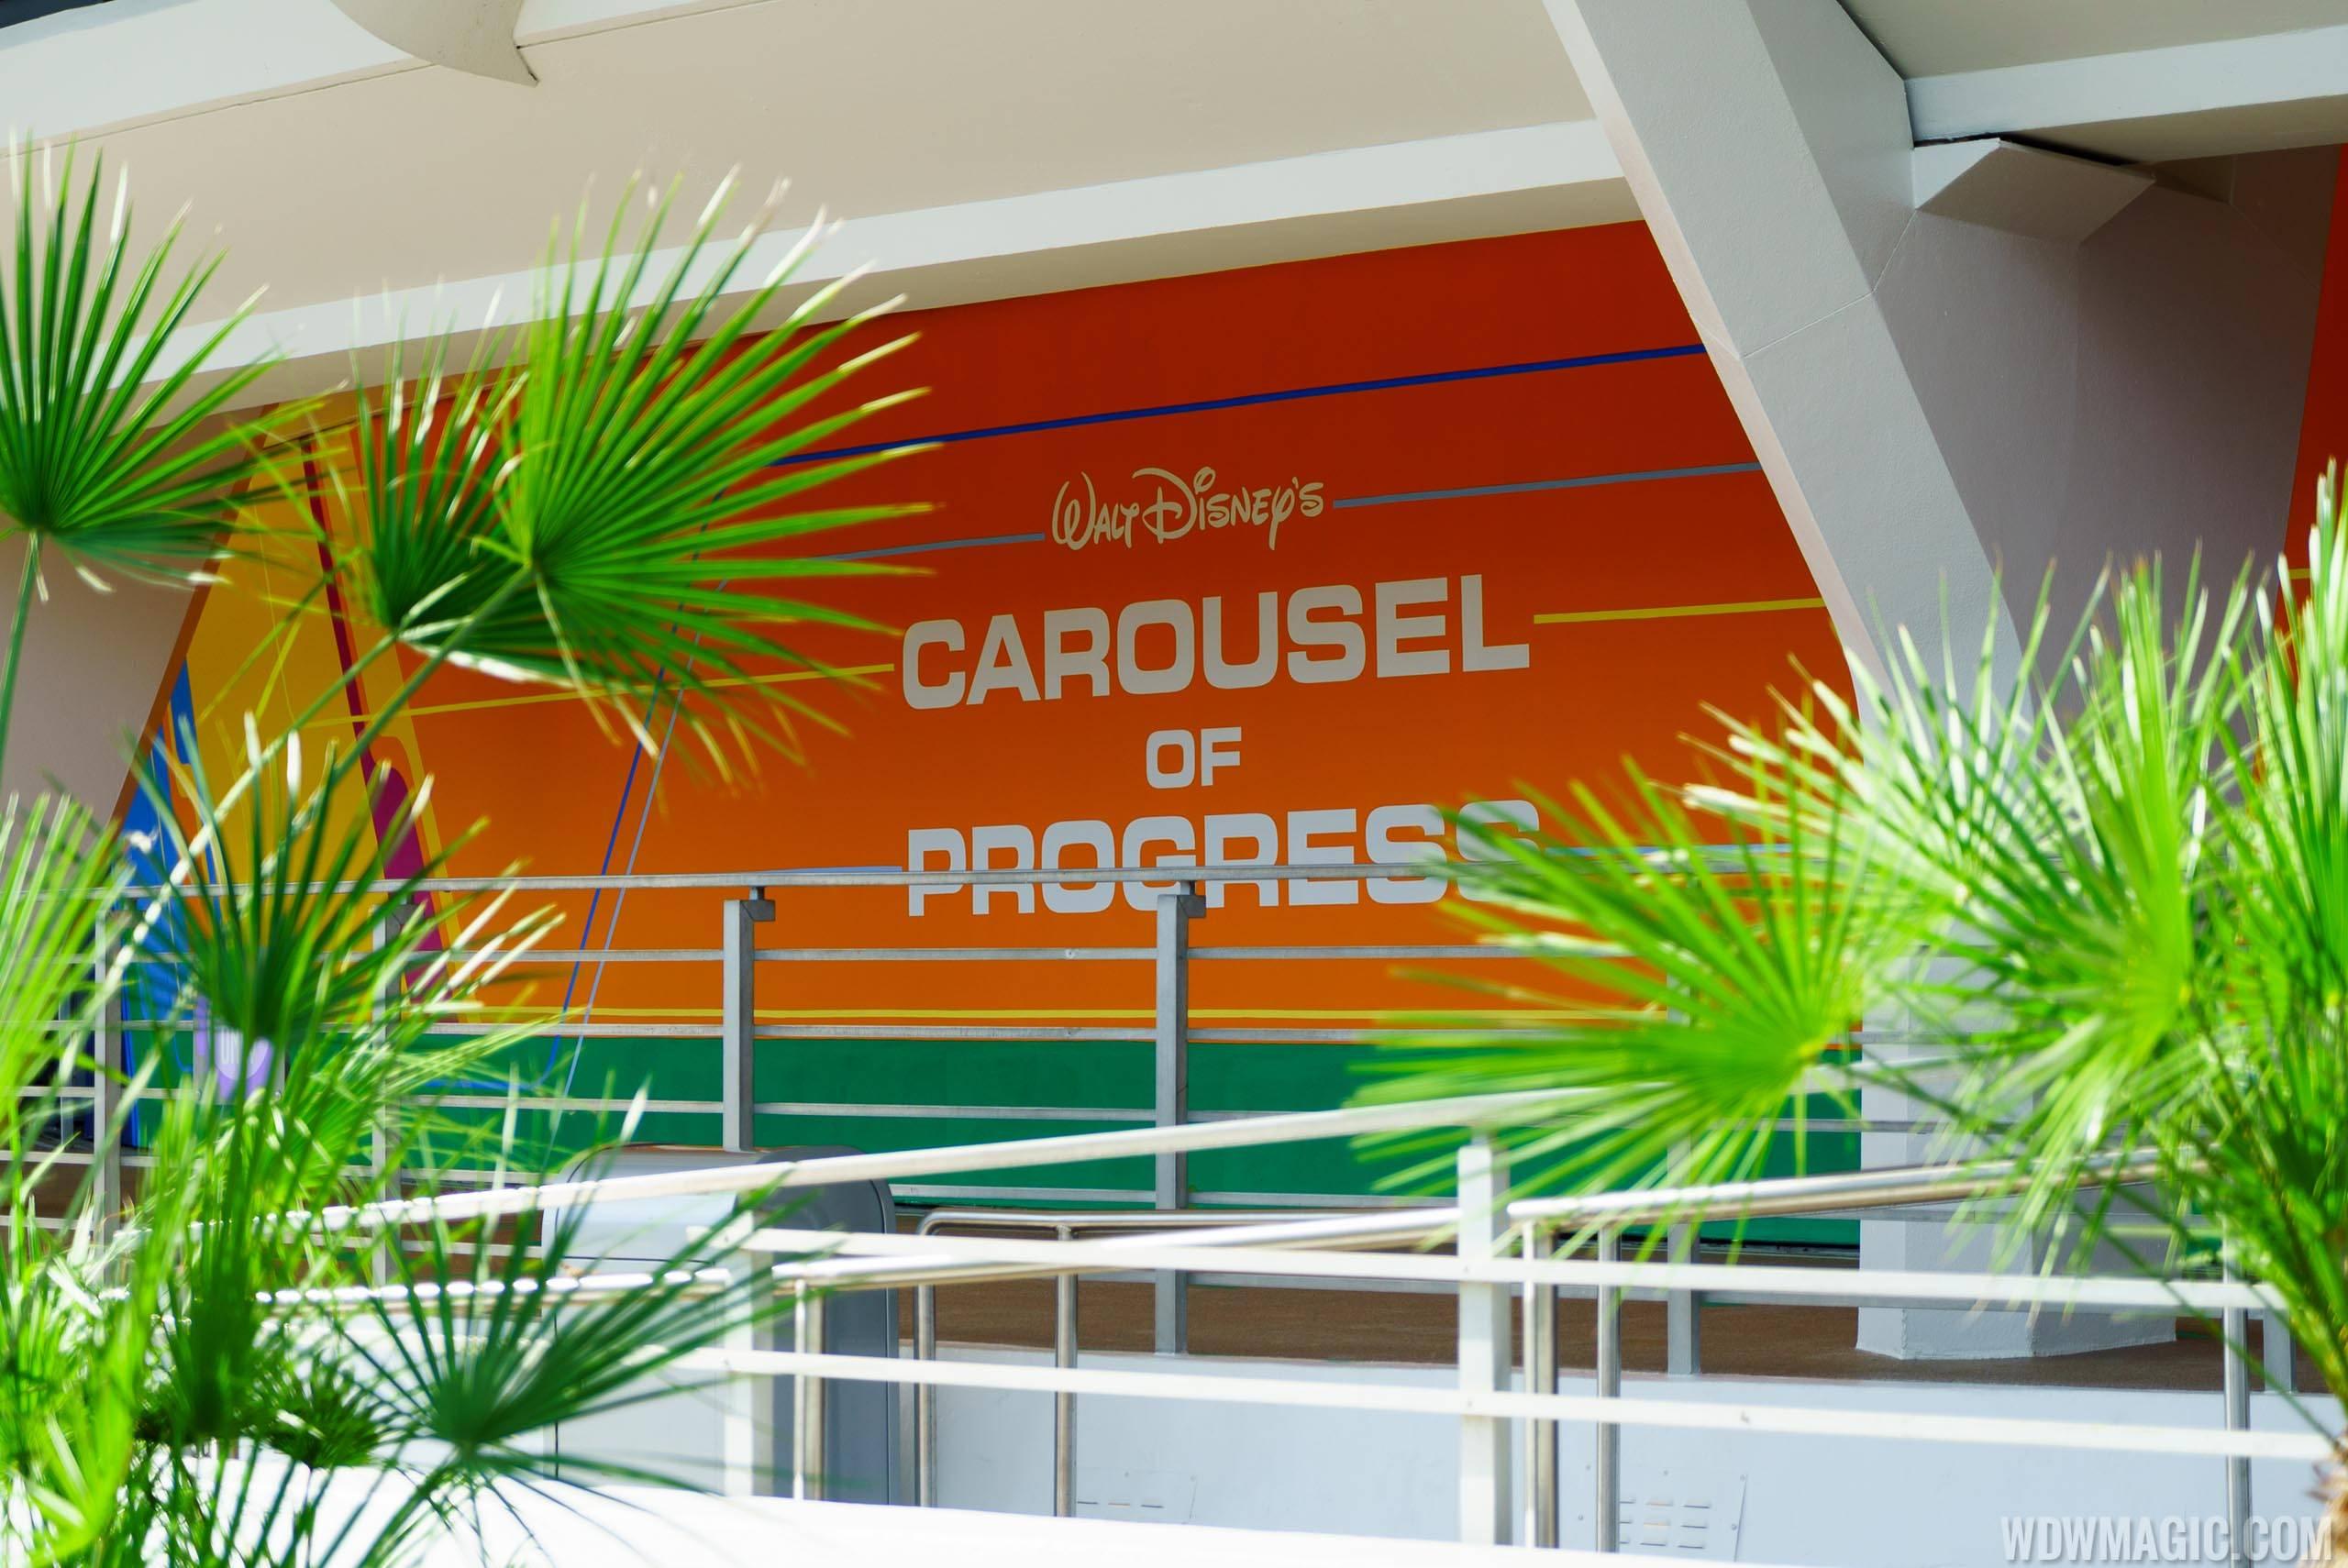 New exterior paint scheme at Carousel of Progress